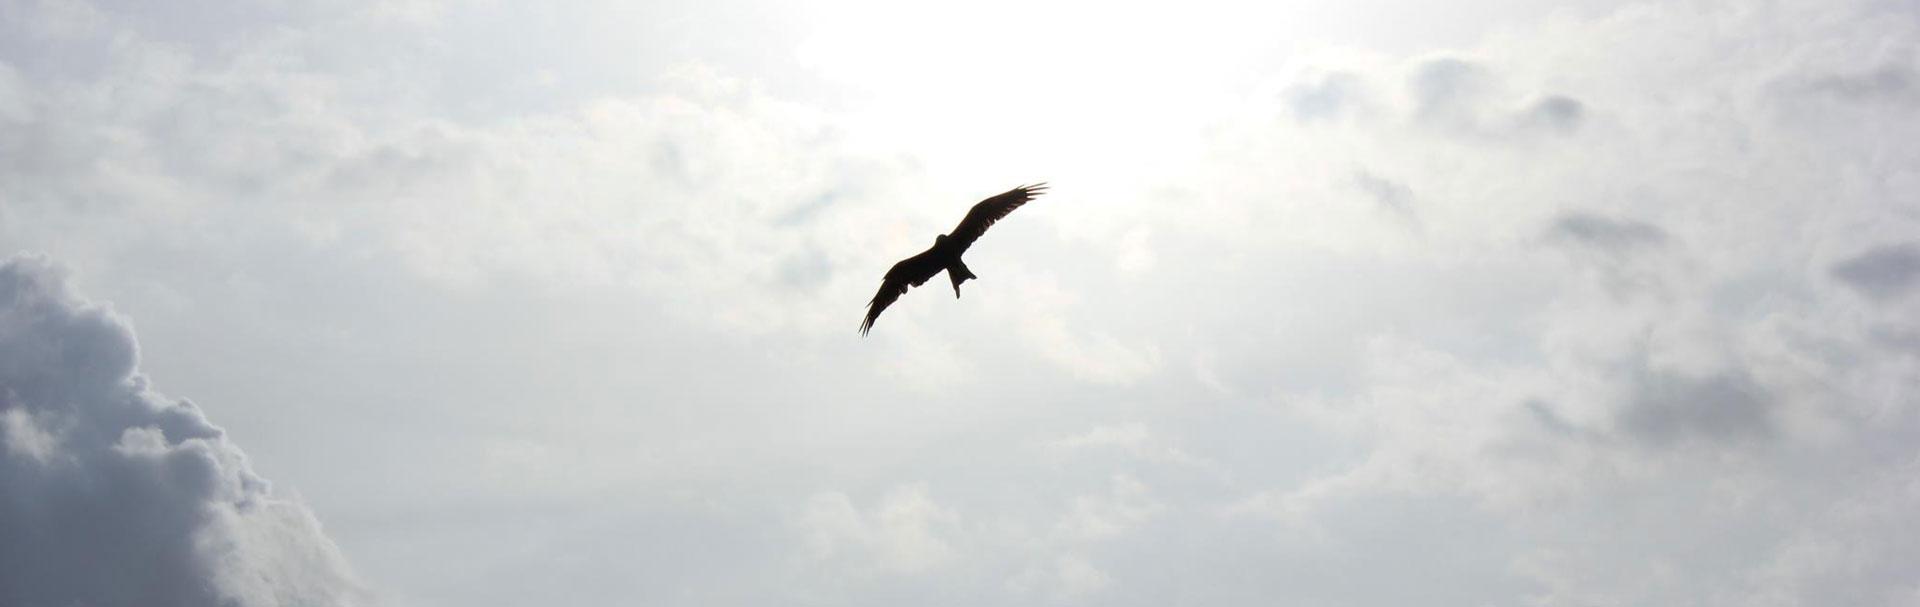 Corvid.Studio - Photo of crow flying - Unsplash image by Naveen Chandra